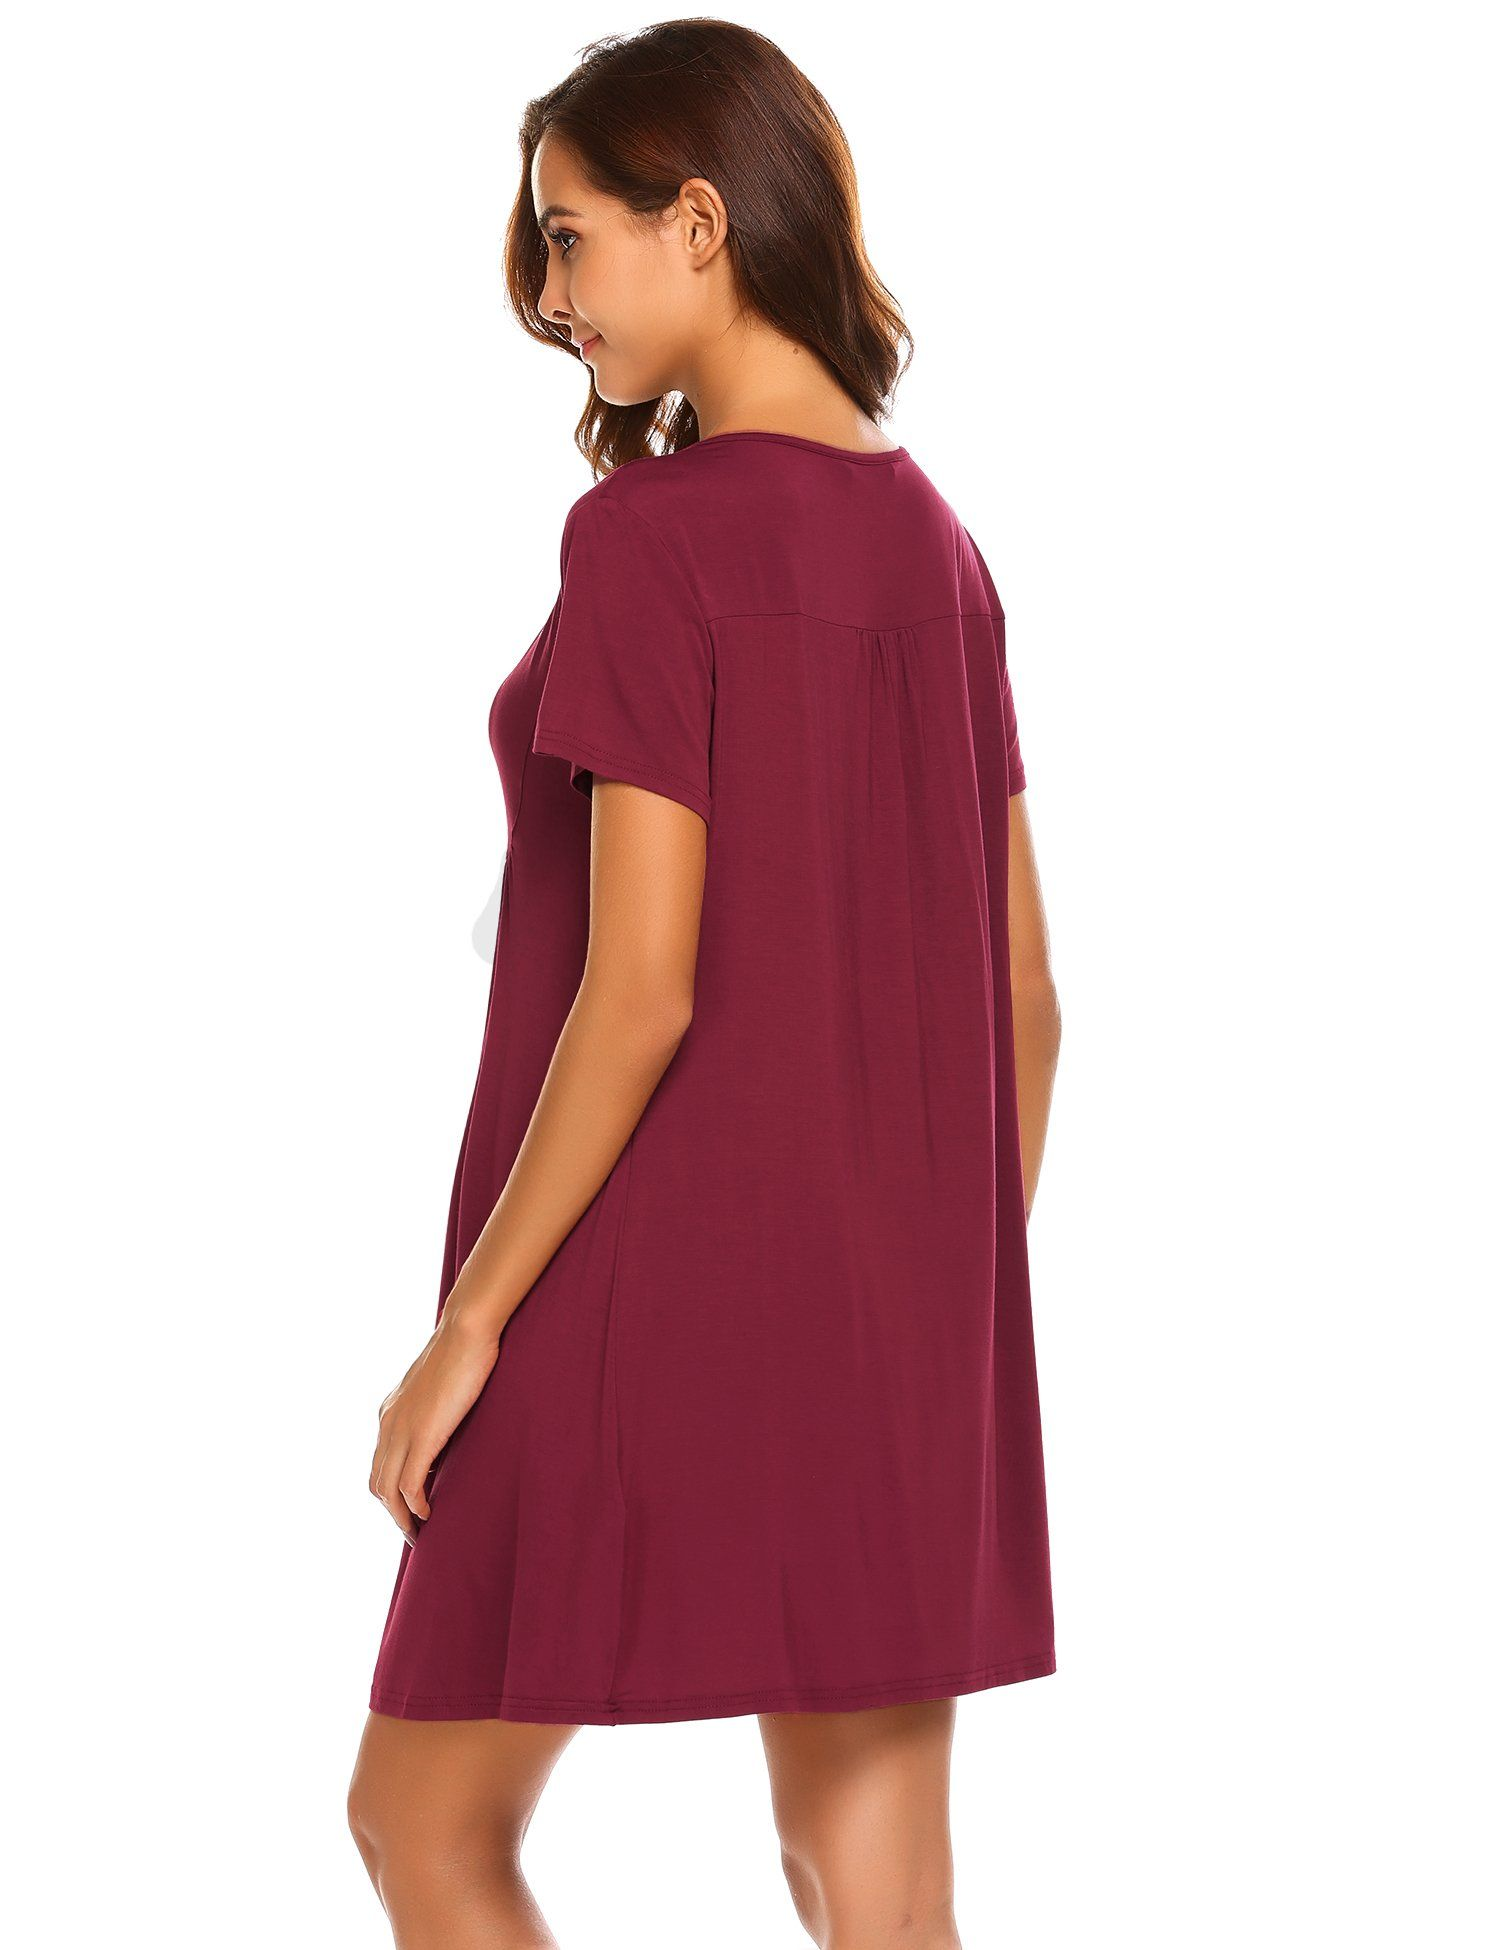 f1936ed9c1c Ekouaer Breastfeeding NightgownNursing Dress for Hospital Sleepwear Wine  Red Medium   Click on the image for